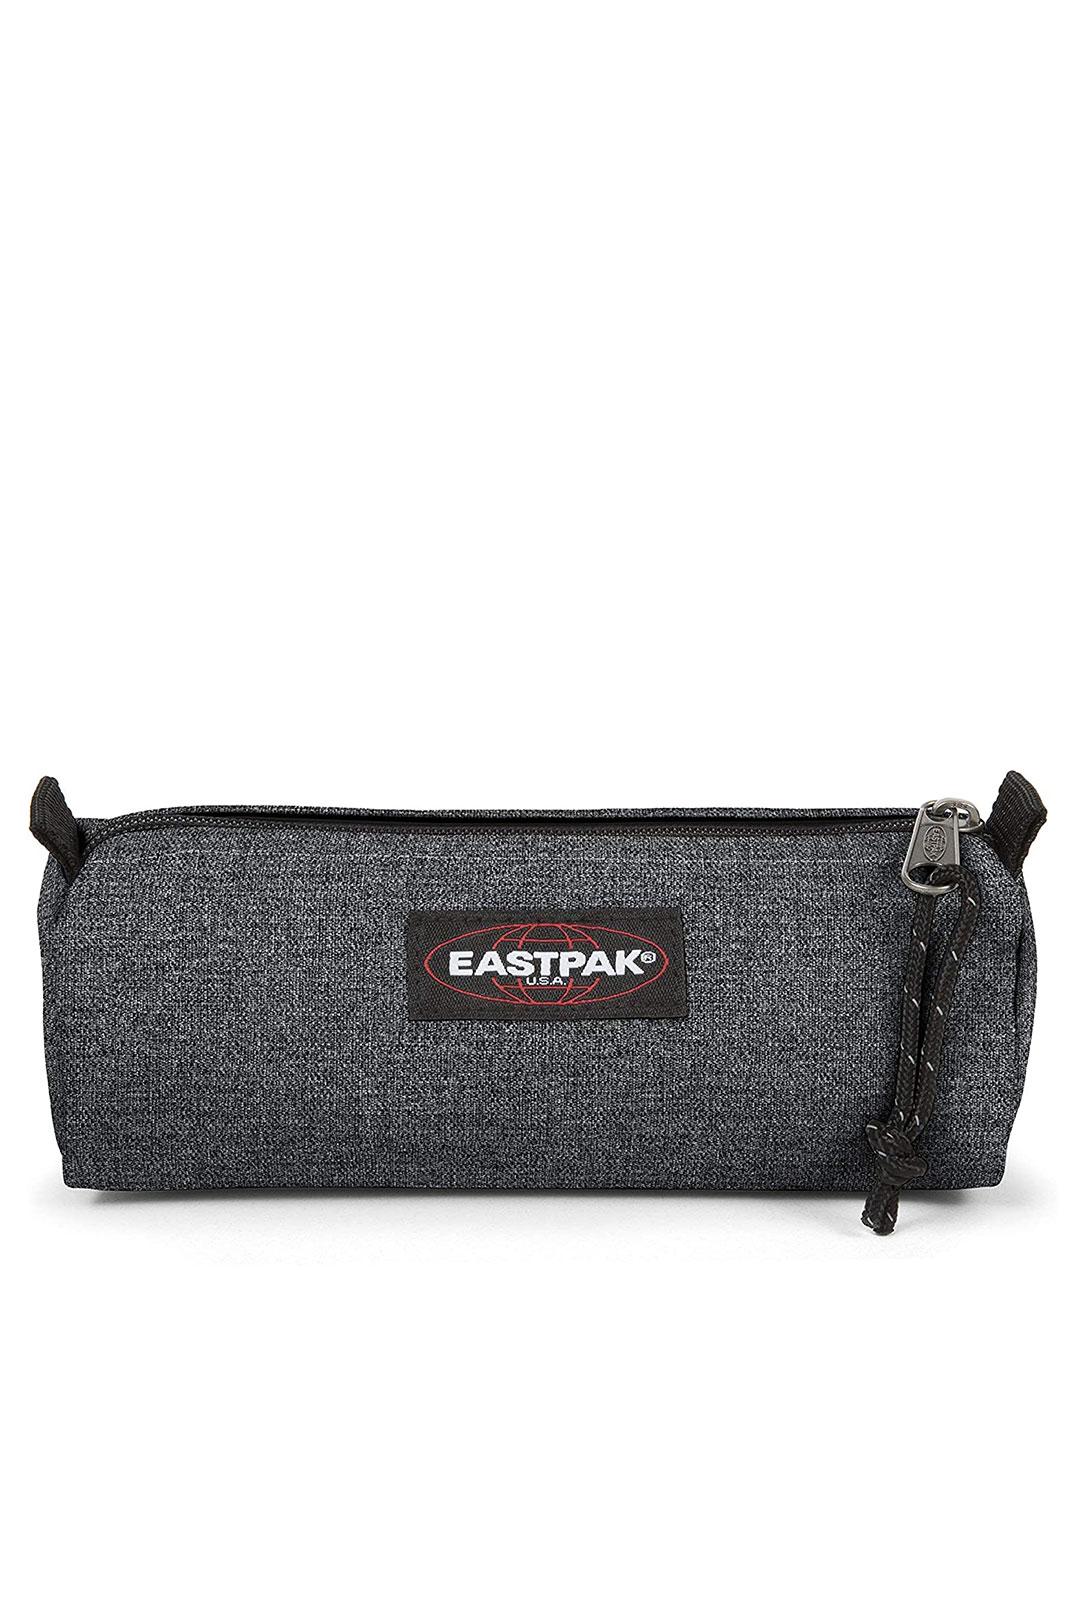 Etuis / Trousses  Eastpak EK37277H BENCHMARK 77H gris